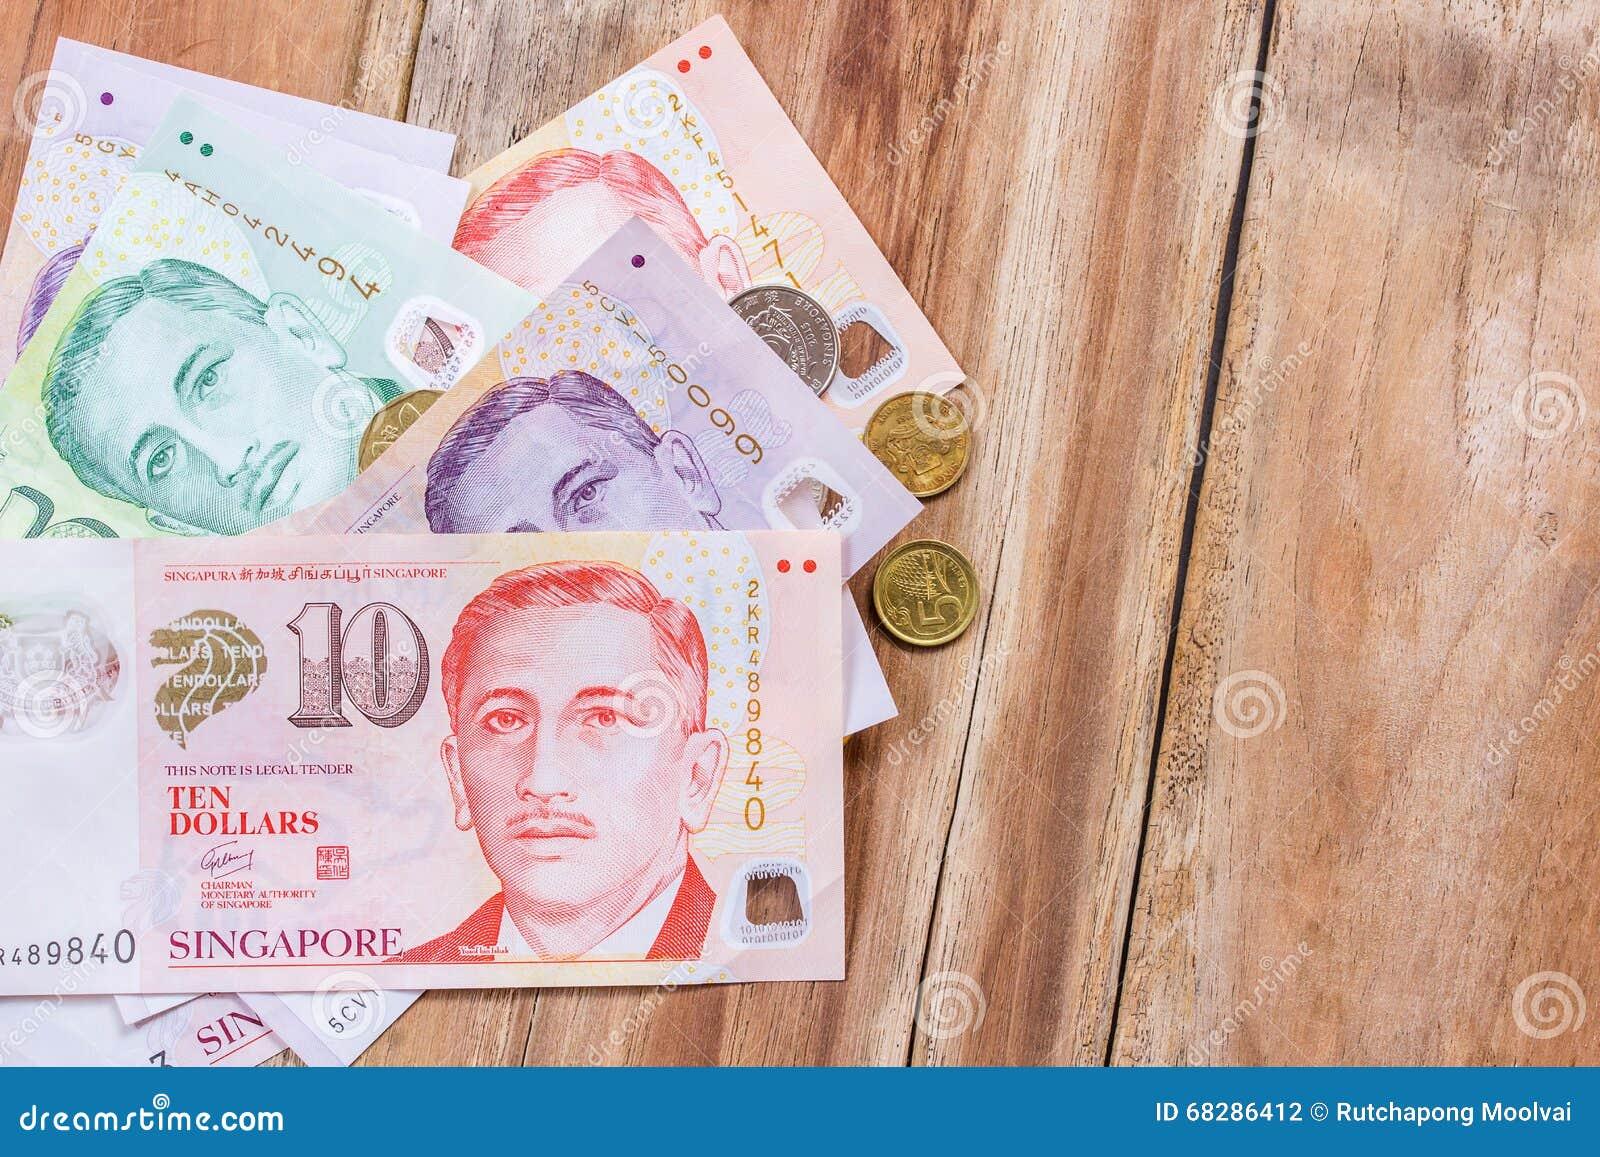 Singapore money on wooden table background stock photo image of royalty free stock photo biocorpaavc